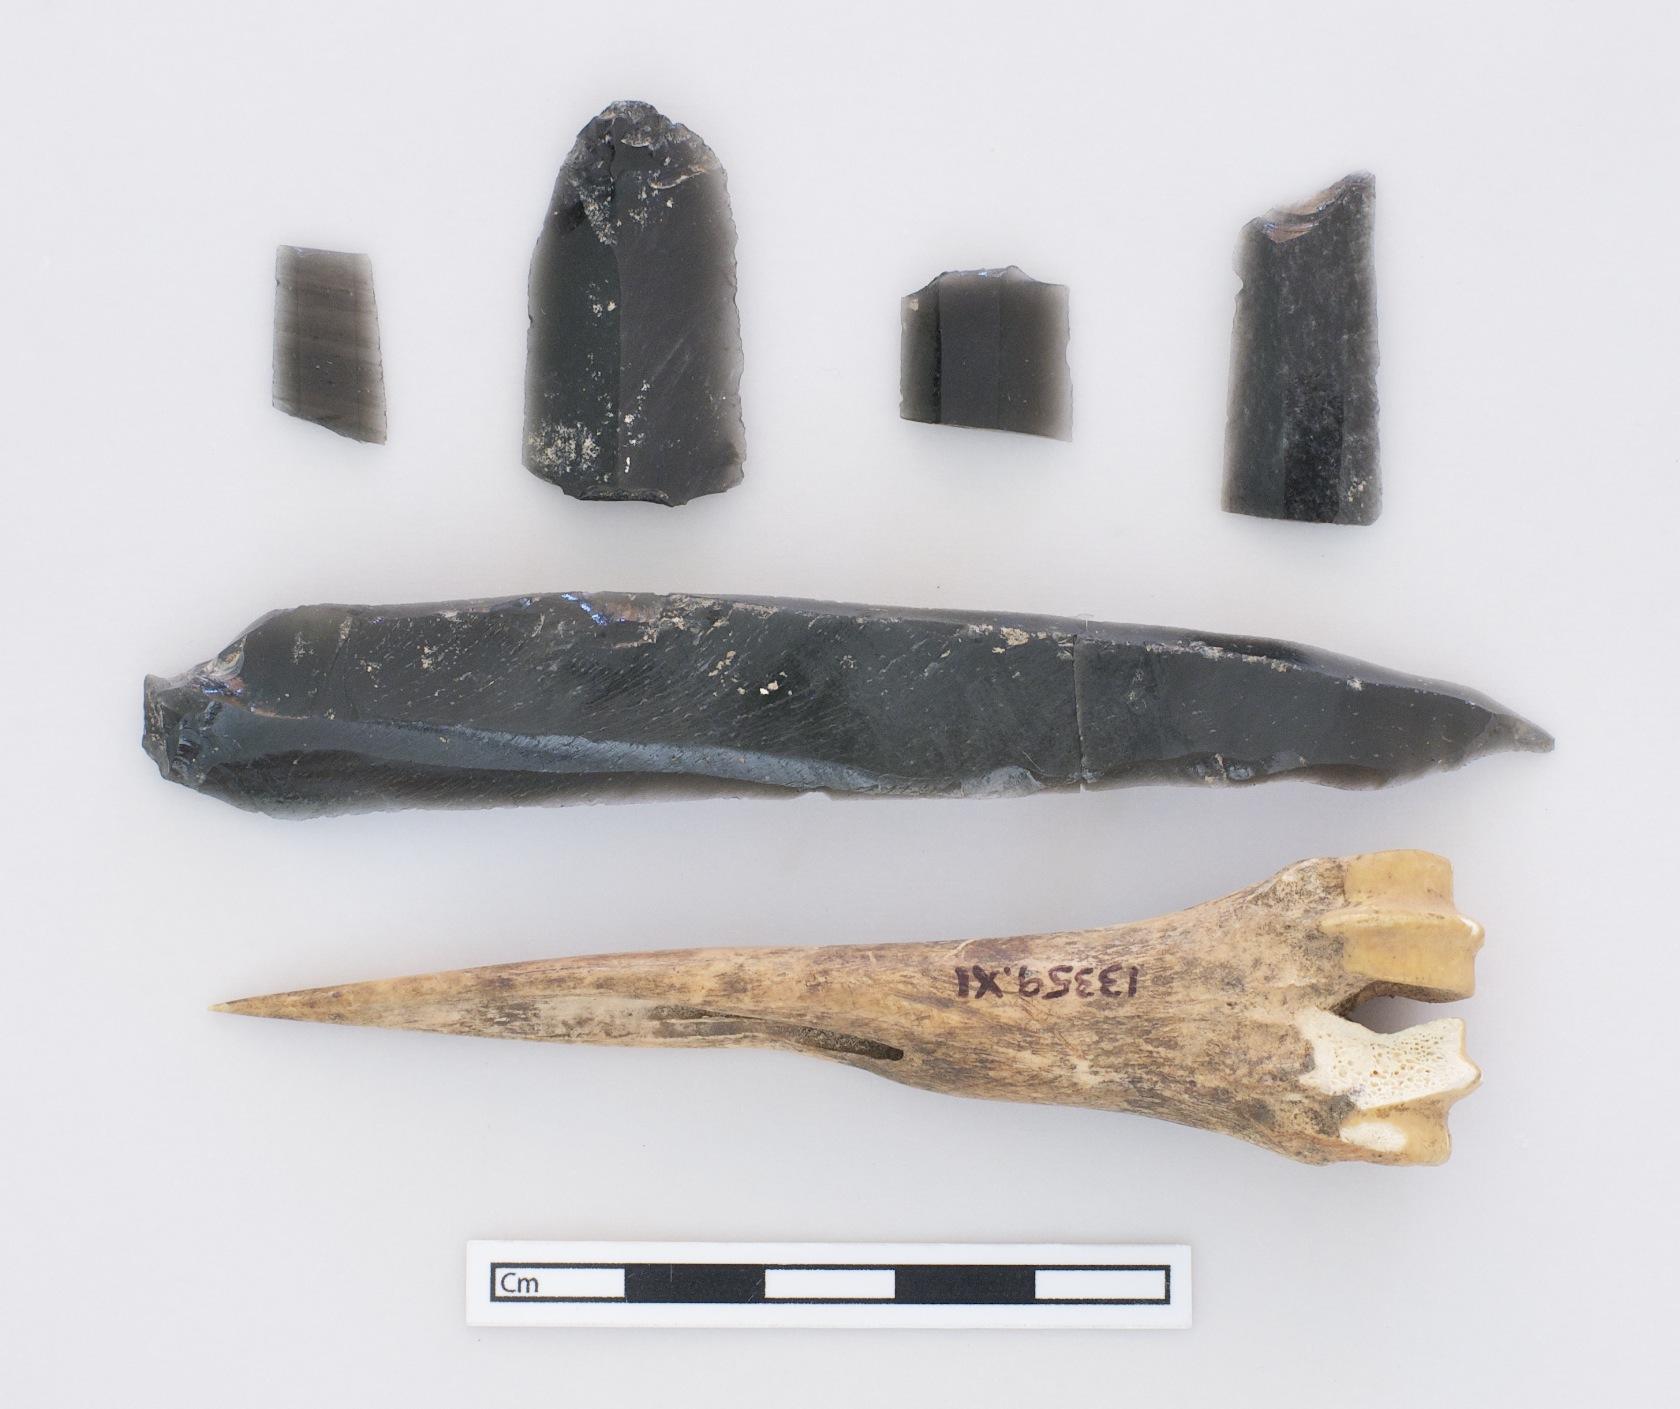 Cluster of obsidian and worked bone, Çatalhöyük, Turkey.